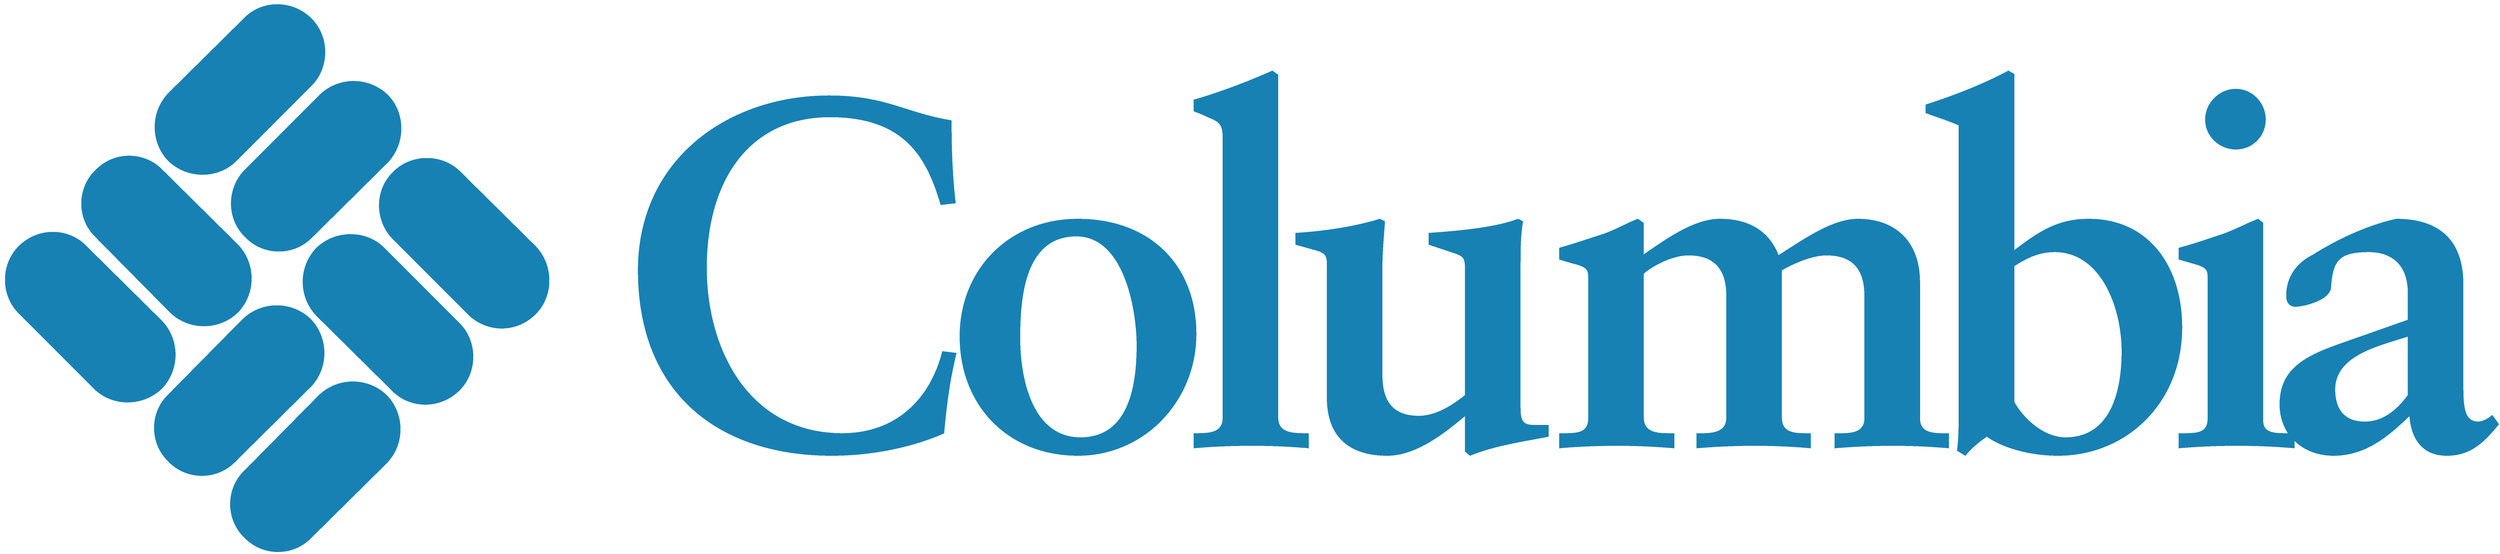 columbia-logo-brand.jpg